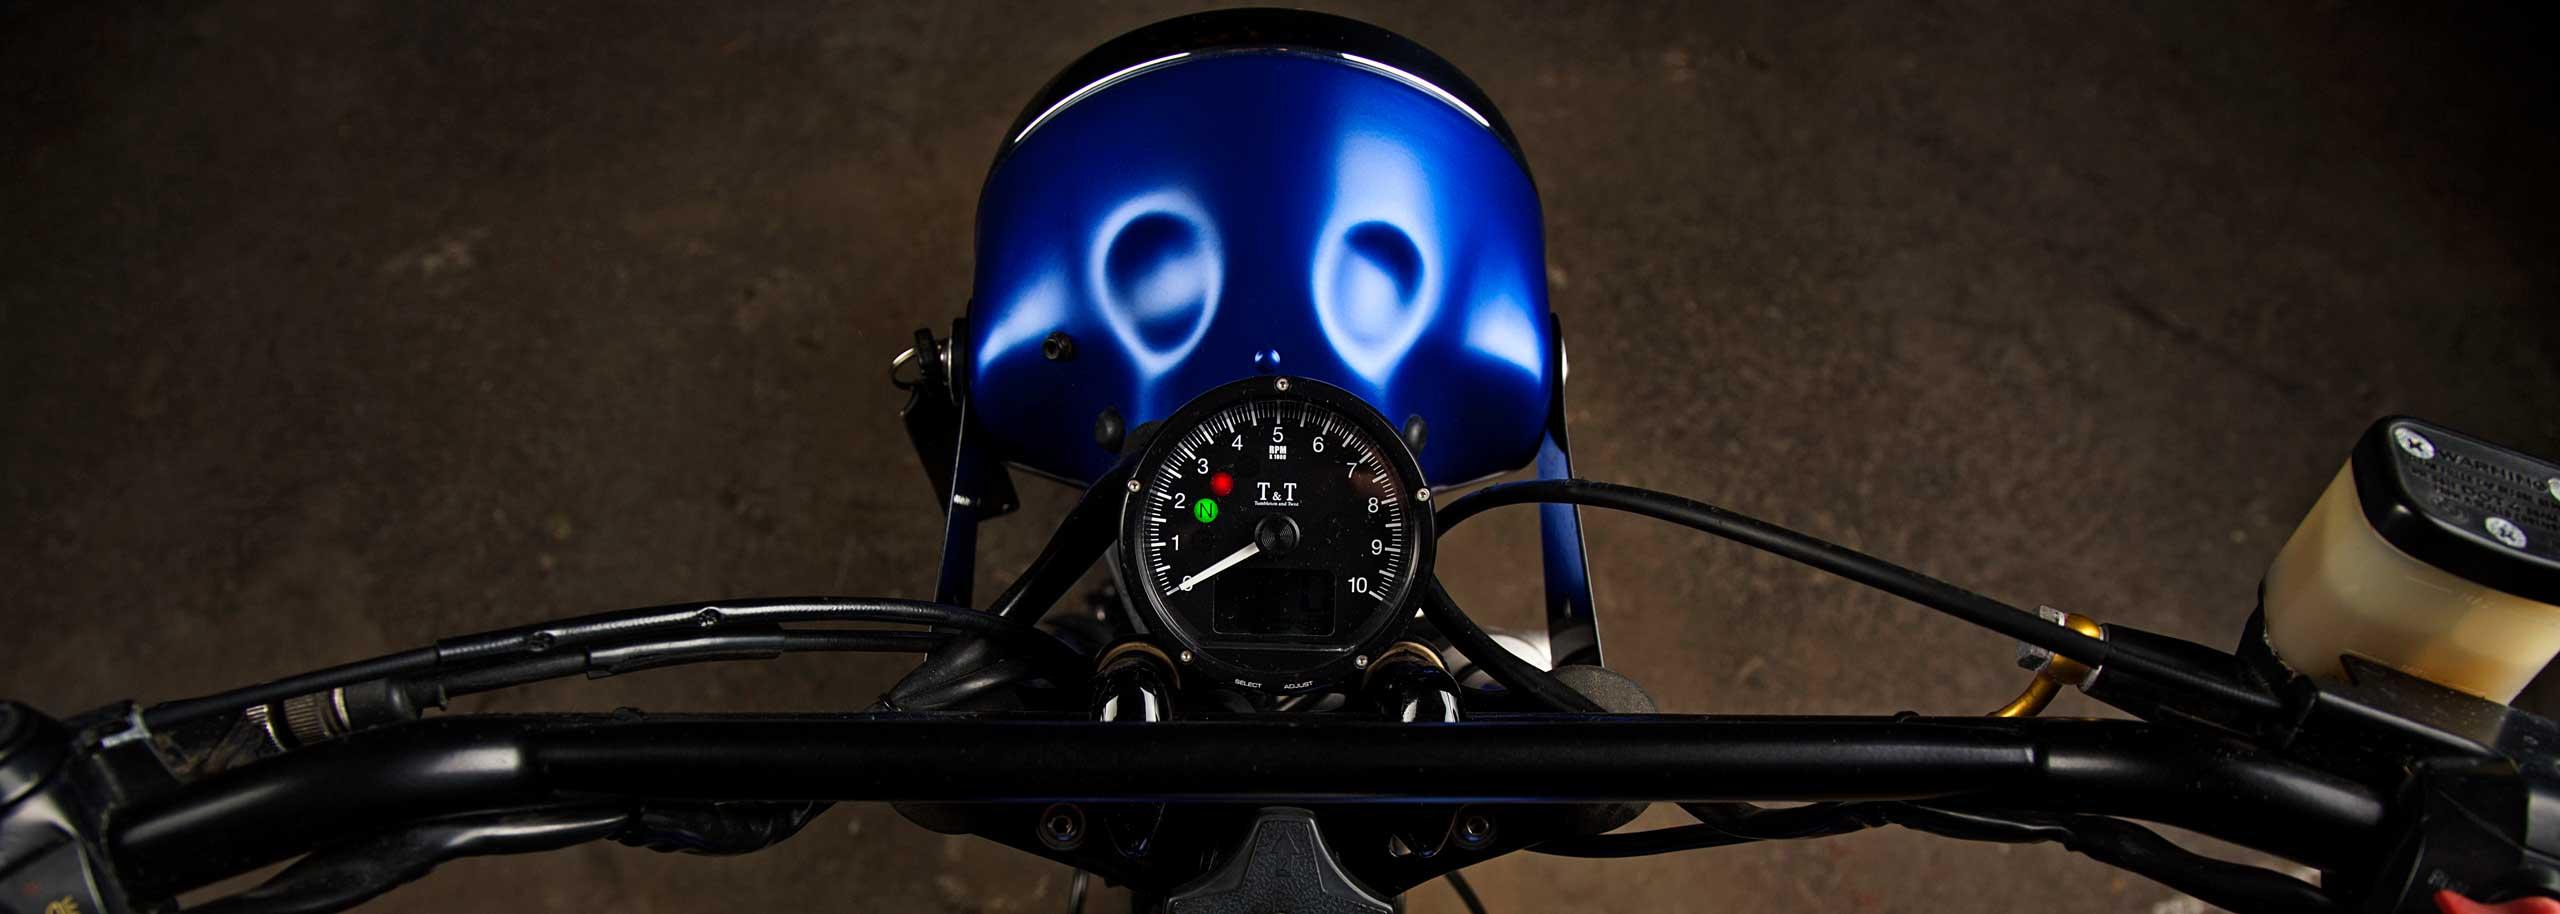 04_TITAN-Milano_BMW-R100-RS_Cafe-Racer-Motorrad-Umbau-Graz-Austria-Heidenau_BMW-Motorrad-Umbauten_individuell-TYPISIERT